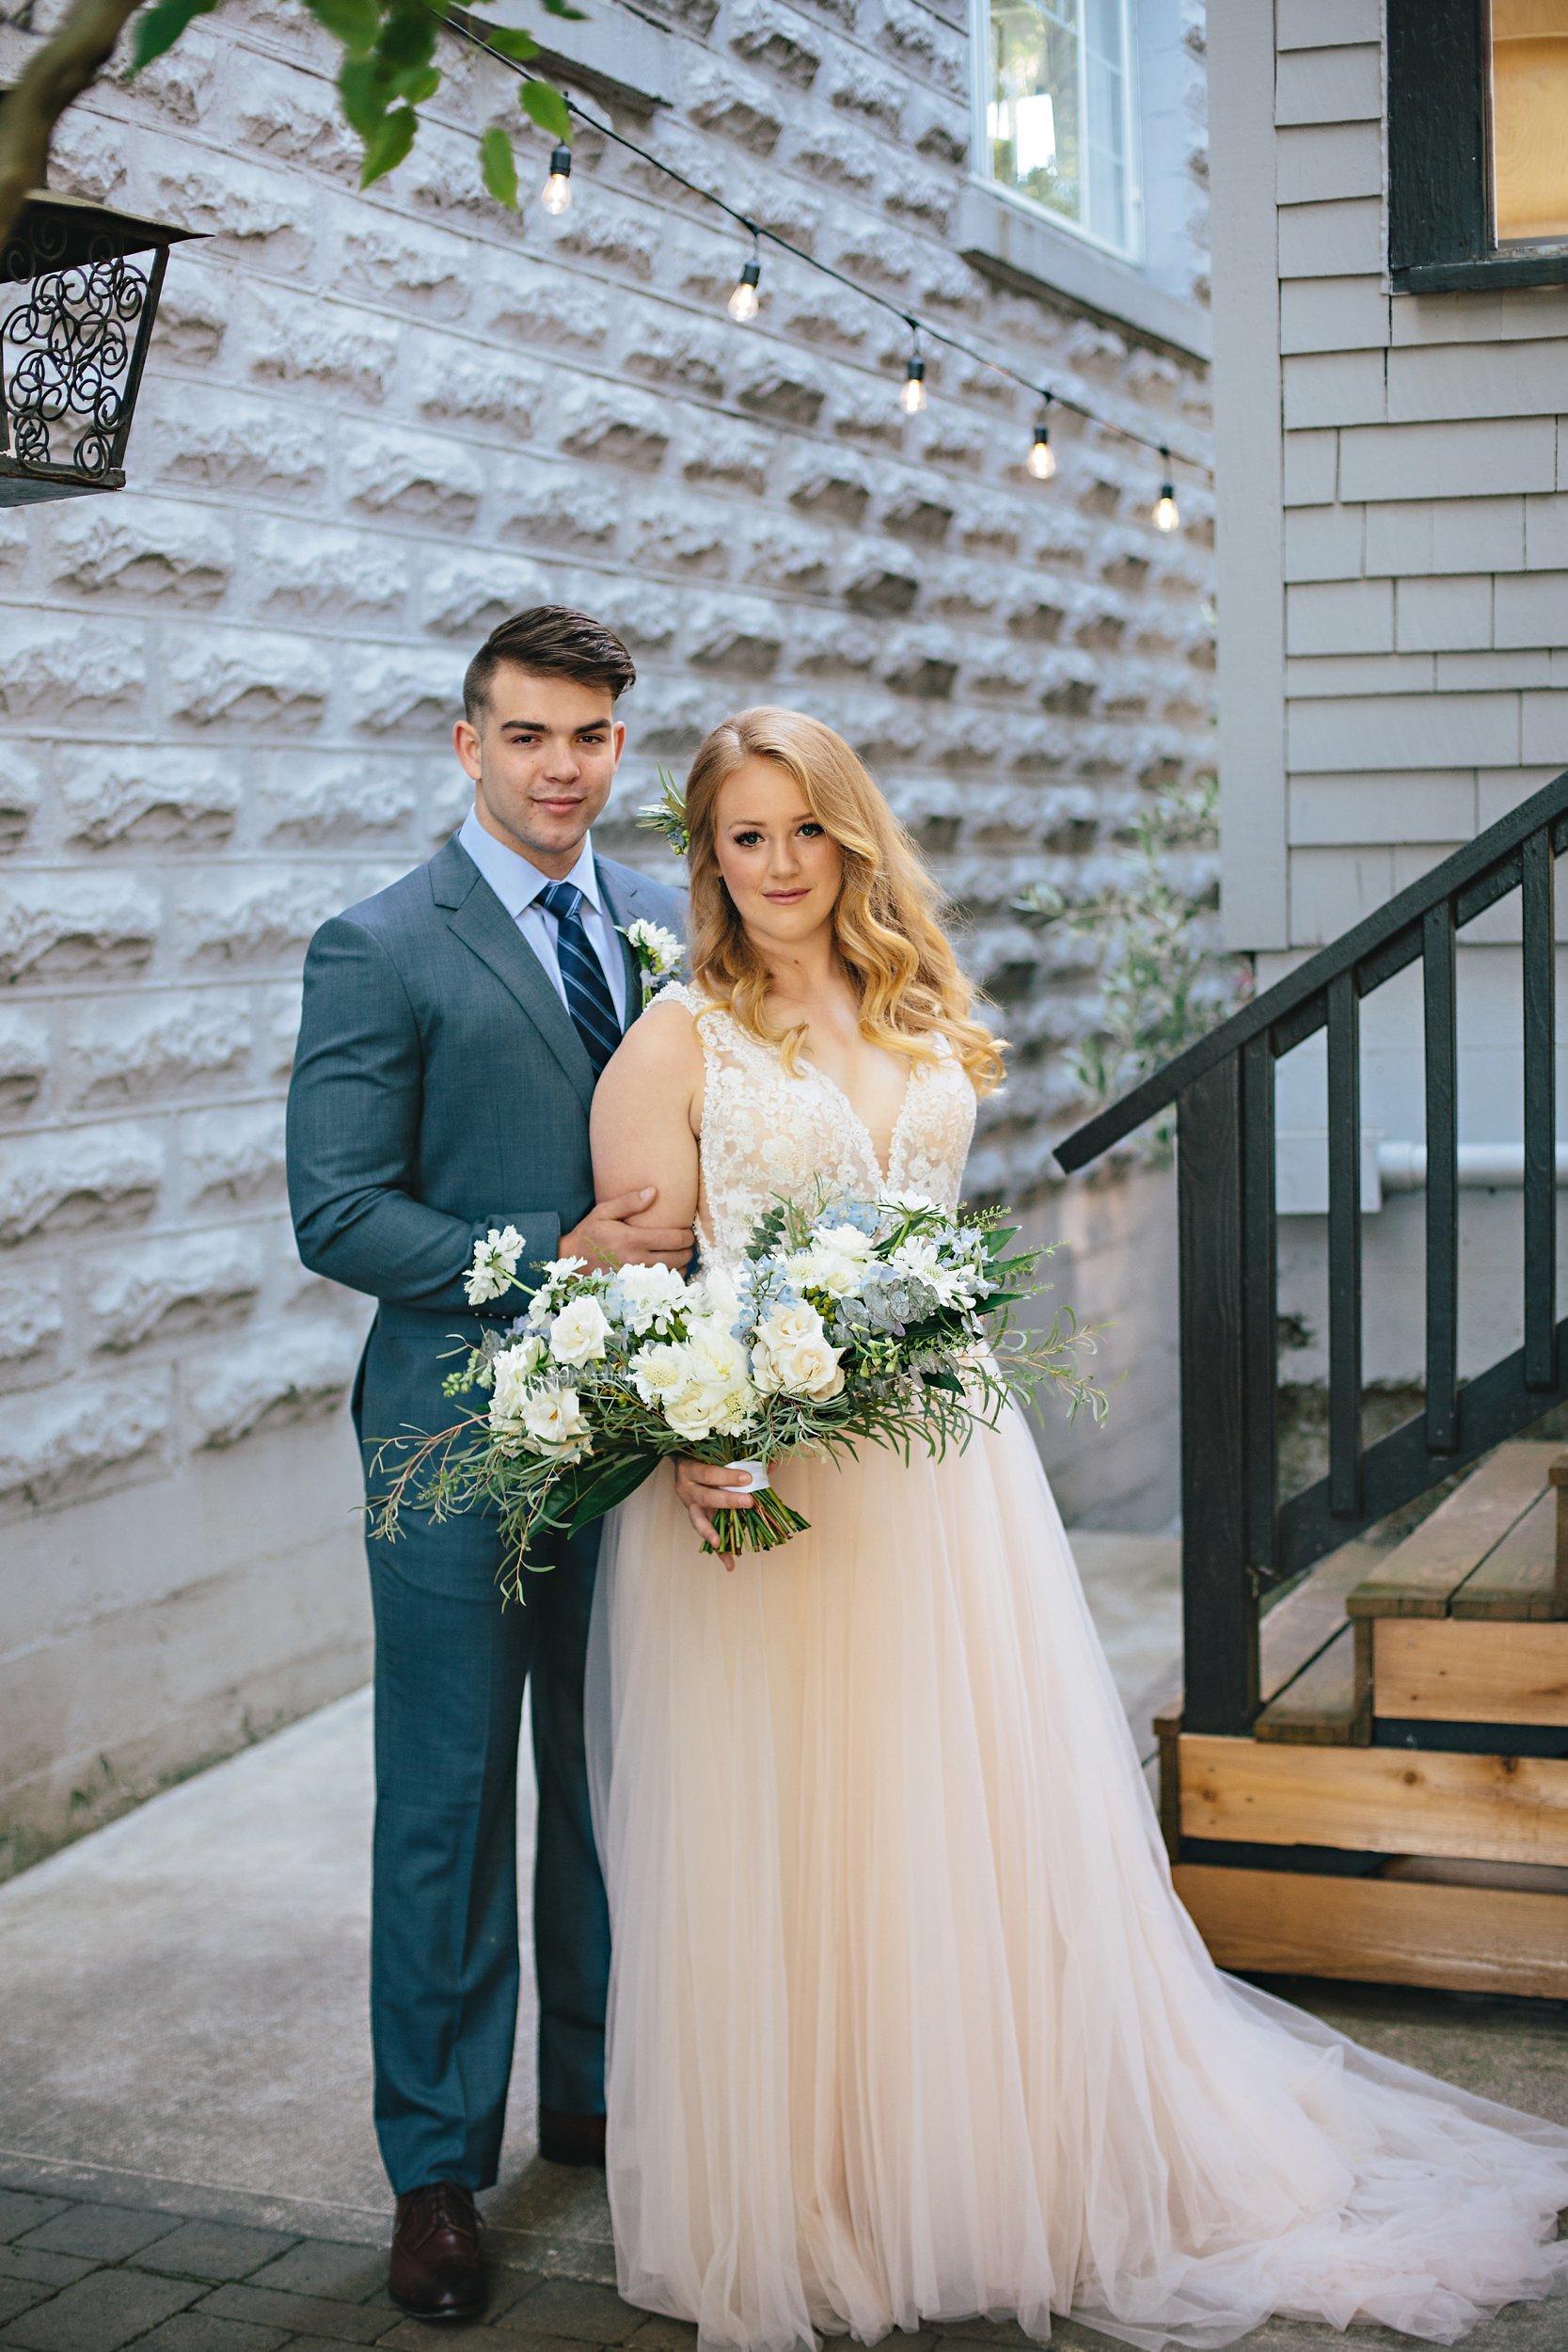 Copy of Summer Garden Wedding: Wedding Portrait